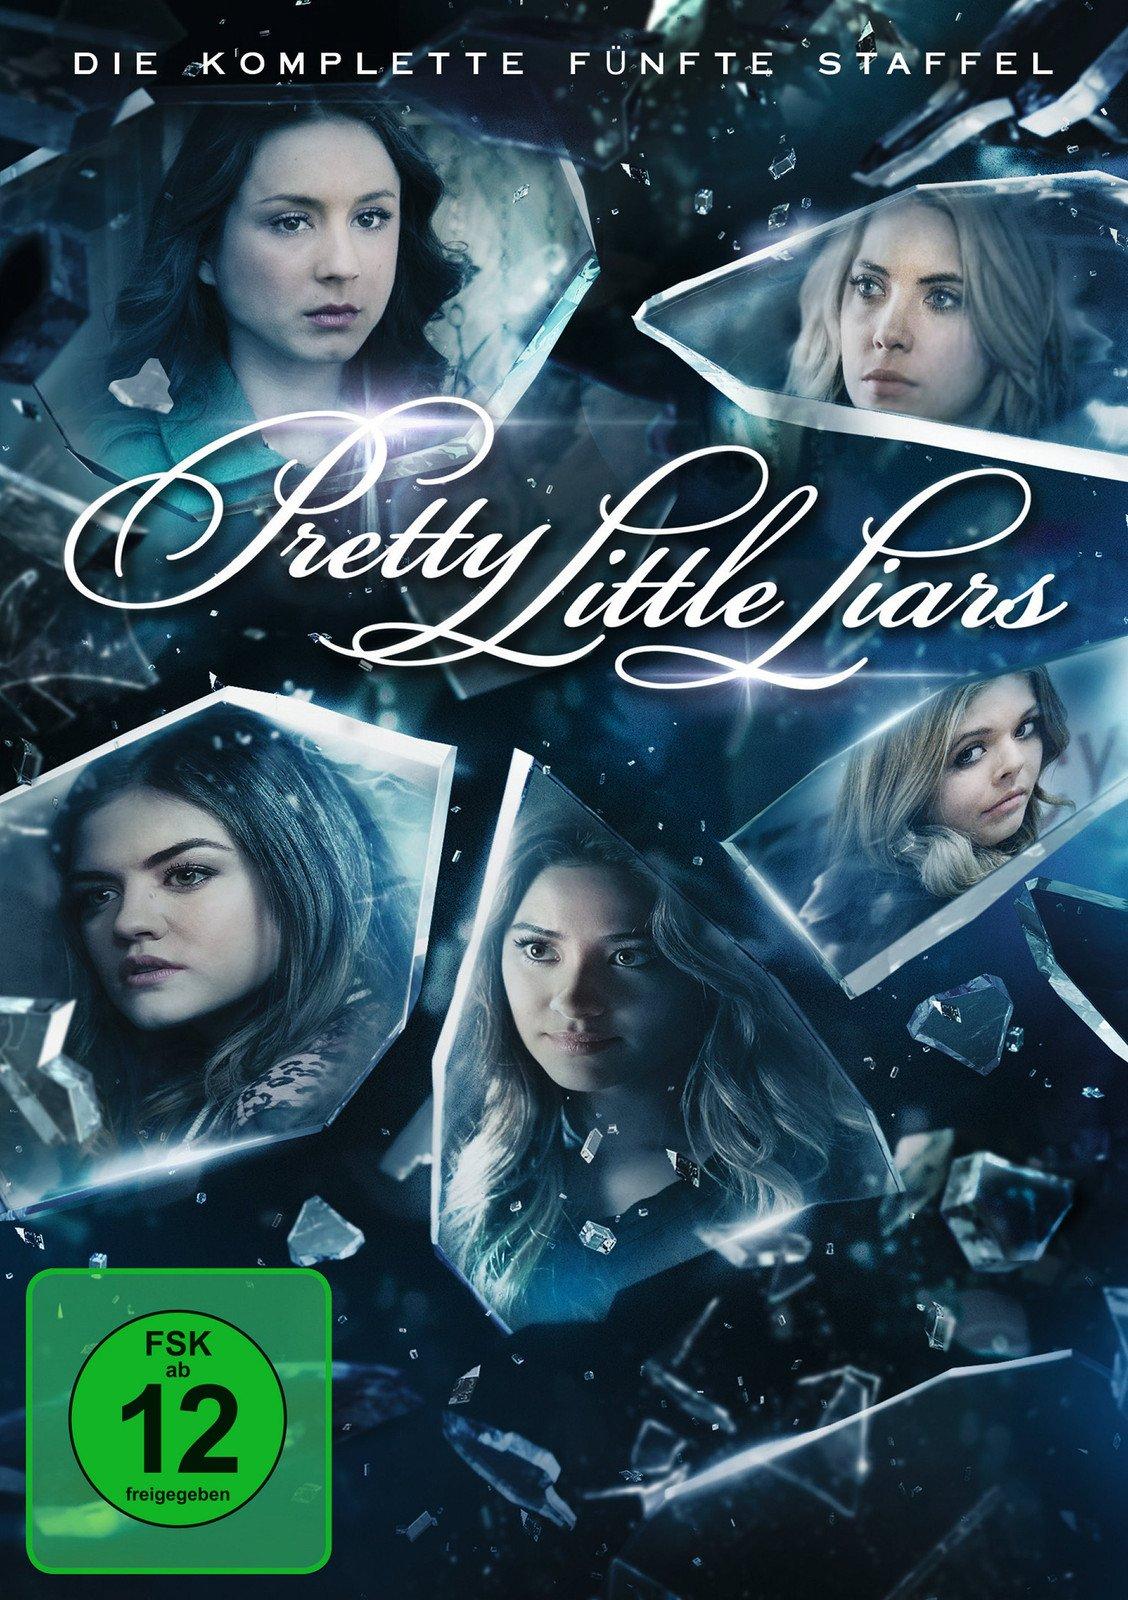 pretty little liars staffel 1 folge 5